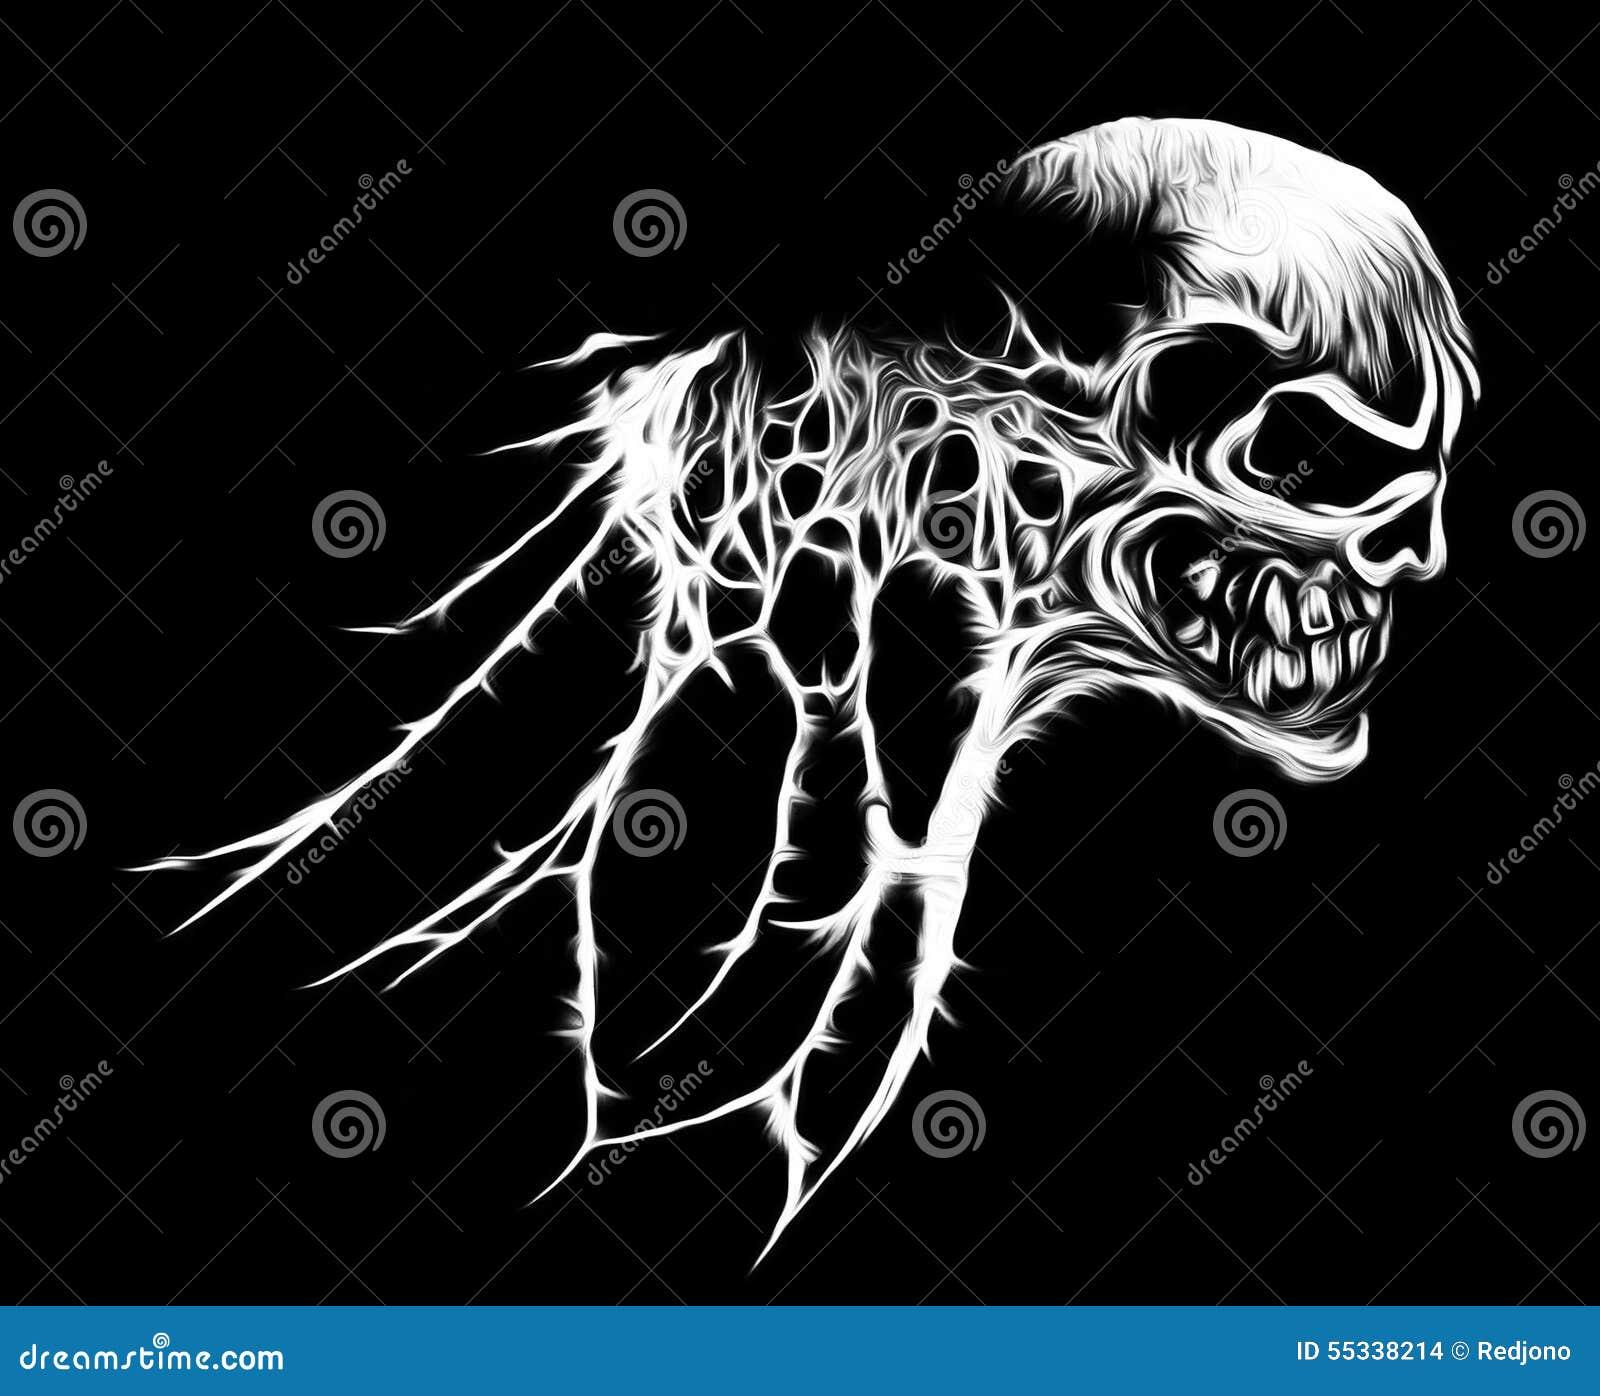 cool spider web skull graphic stock illustration - illustration of